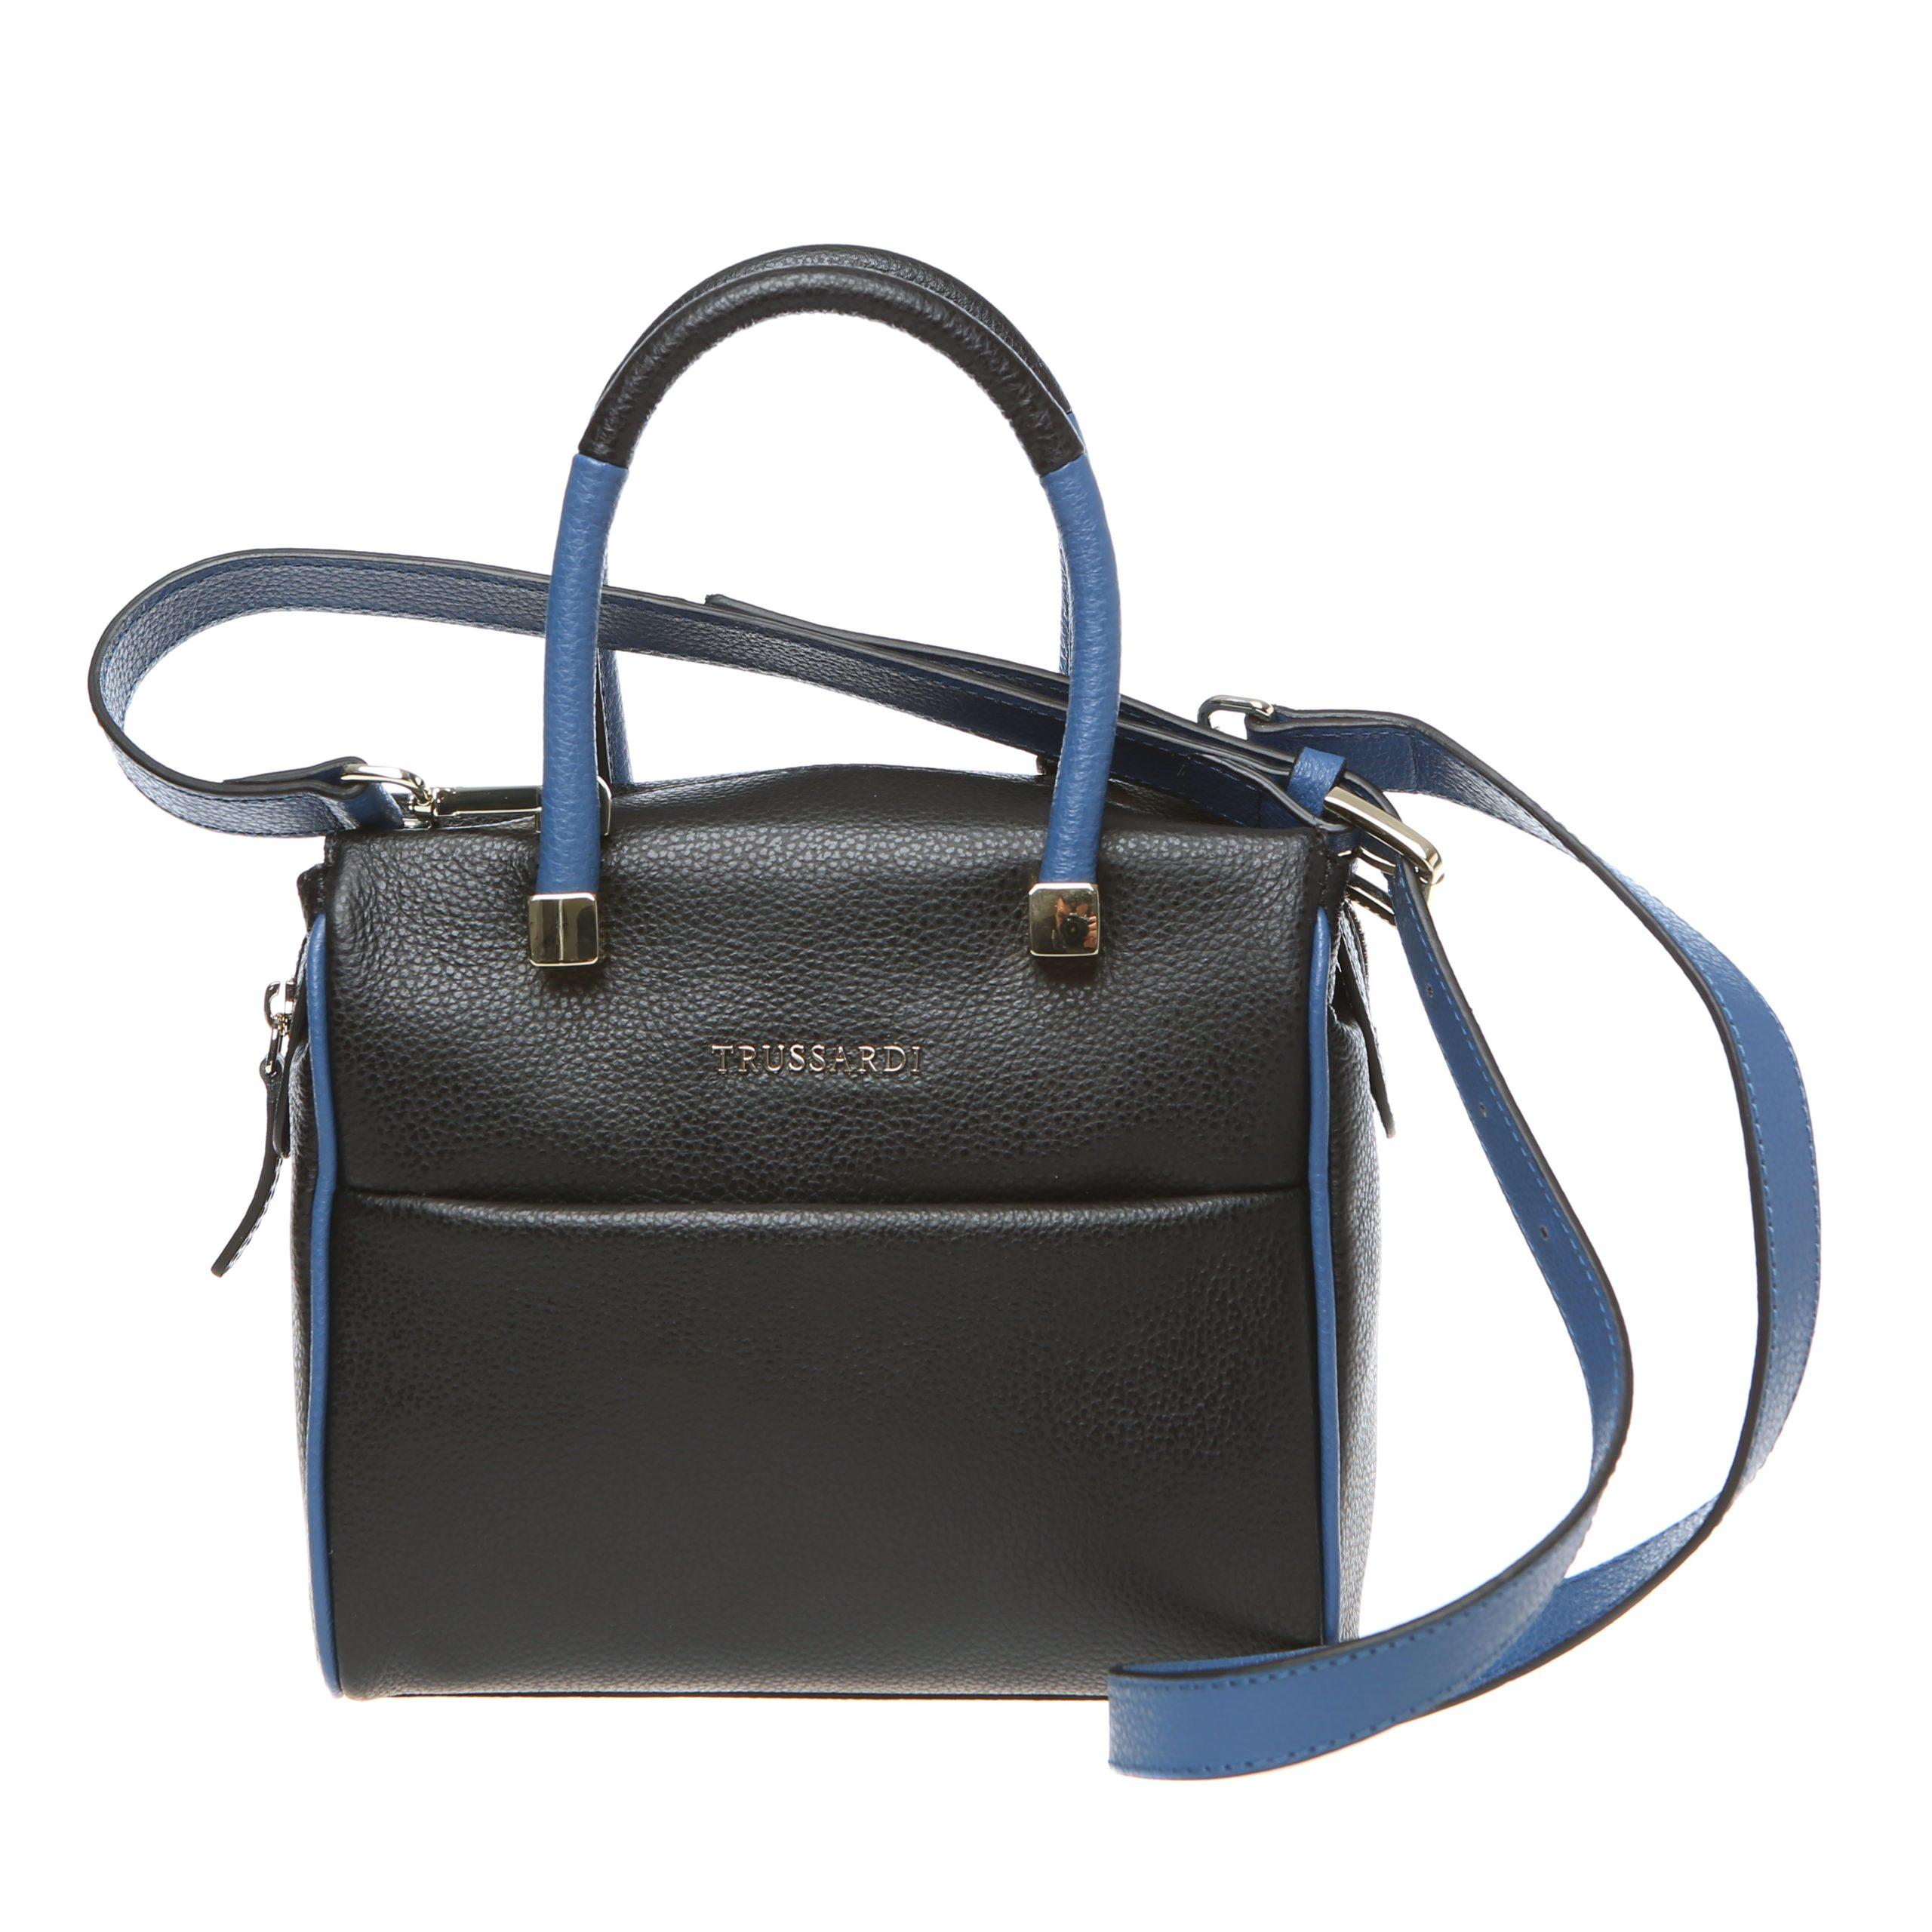 Trussardi Women's Handbag Black 76B265M_19Black-Blue